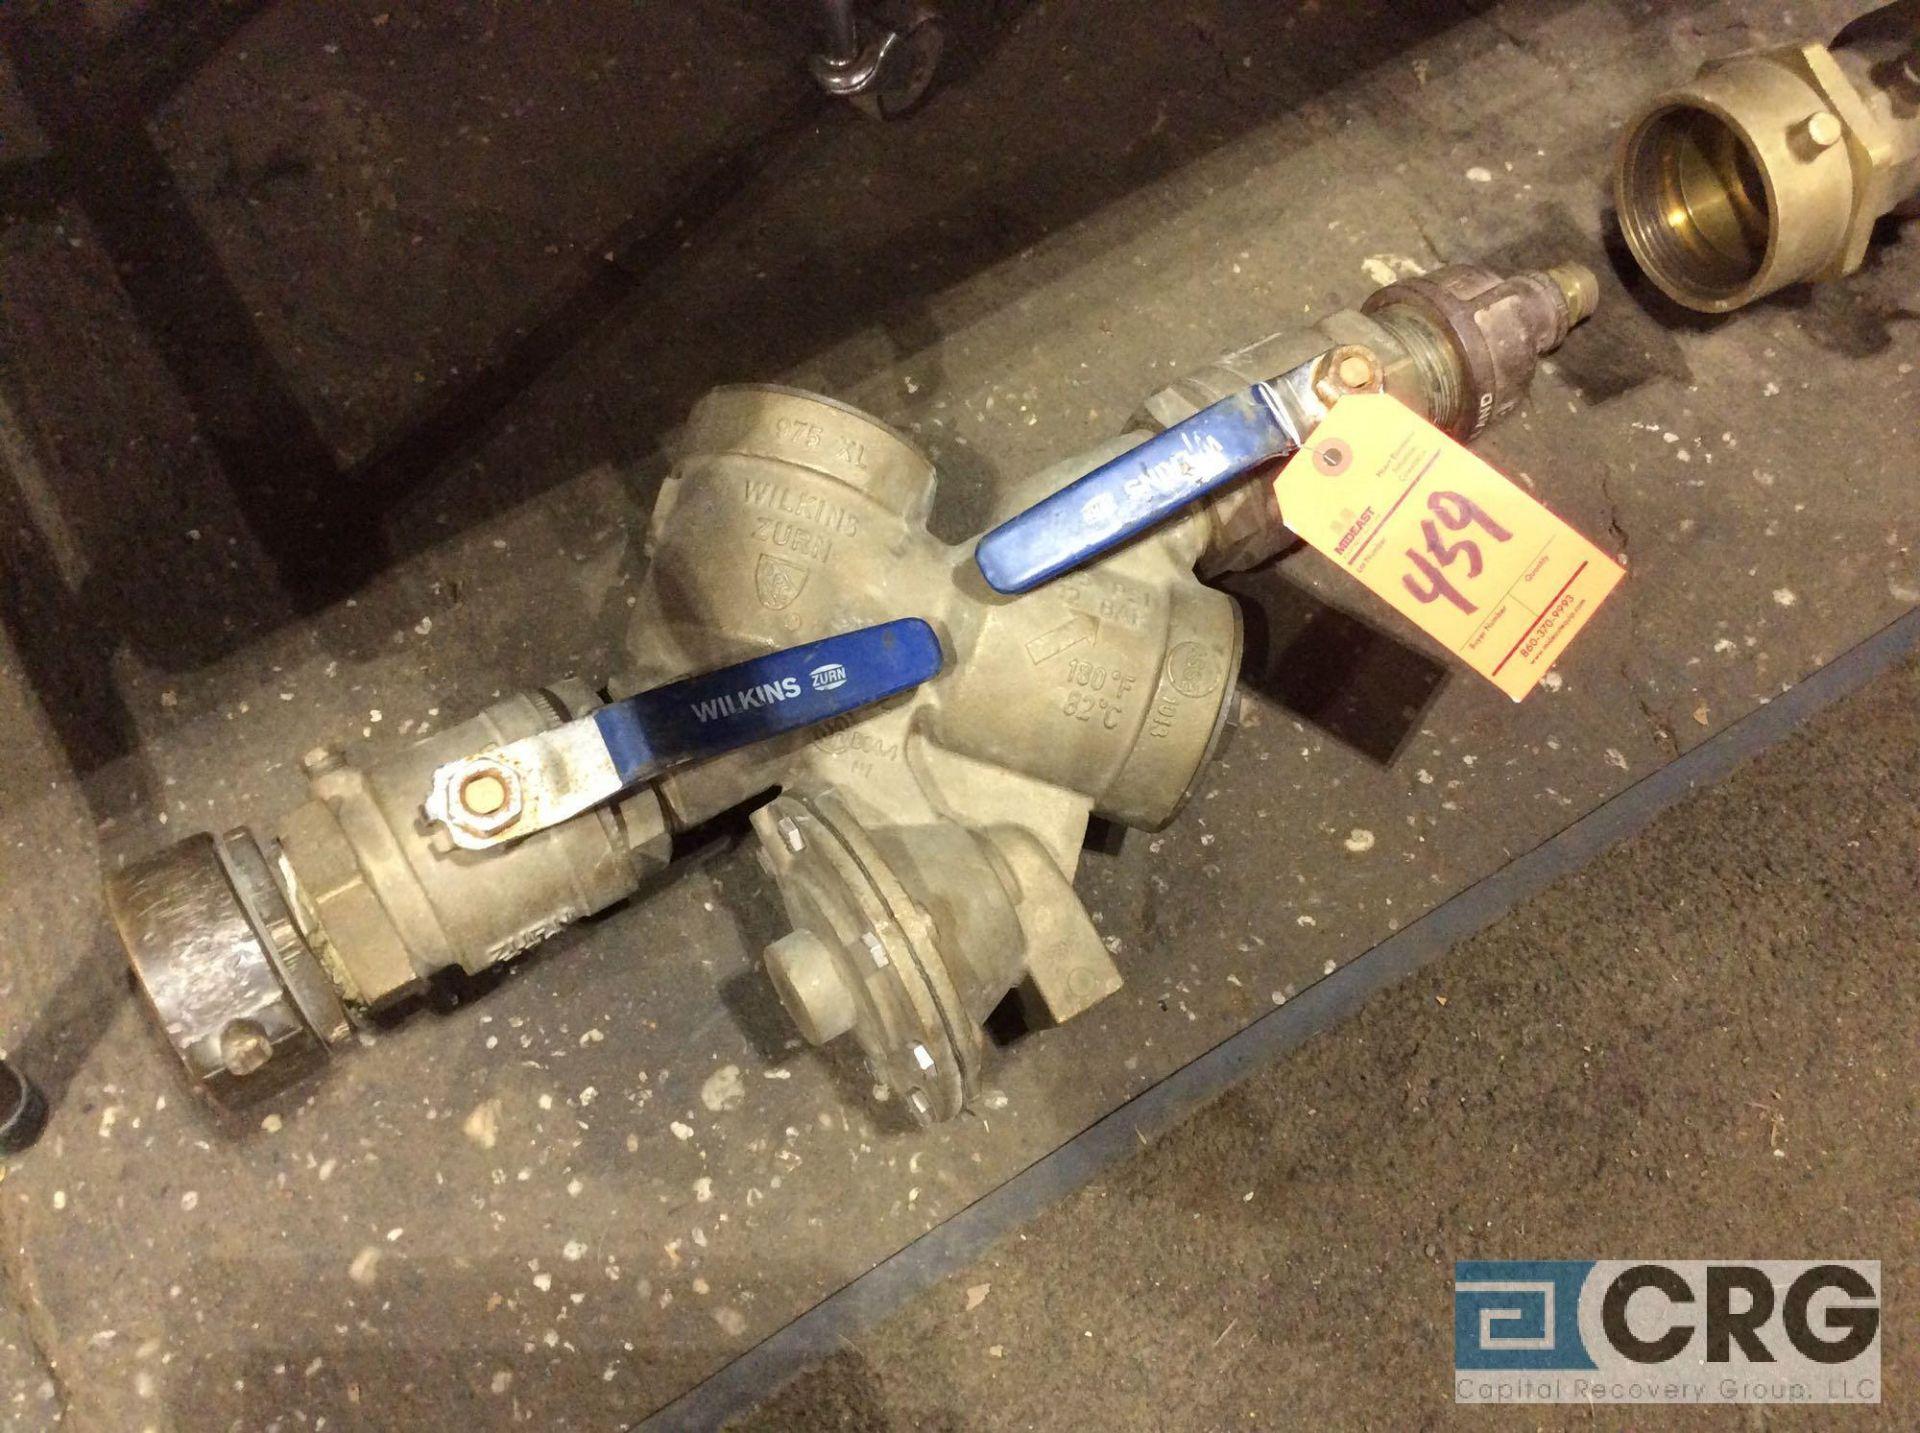 Lot 459 - Wilkins 2 inch back flow preventer